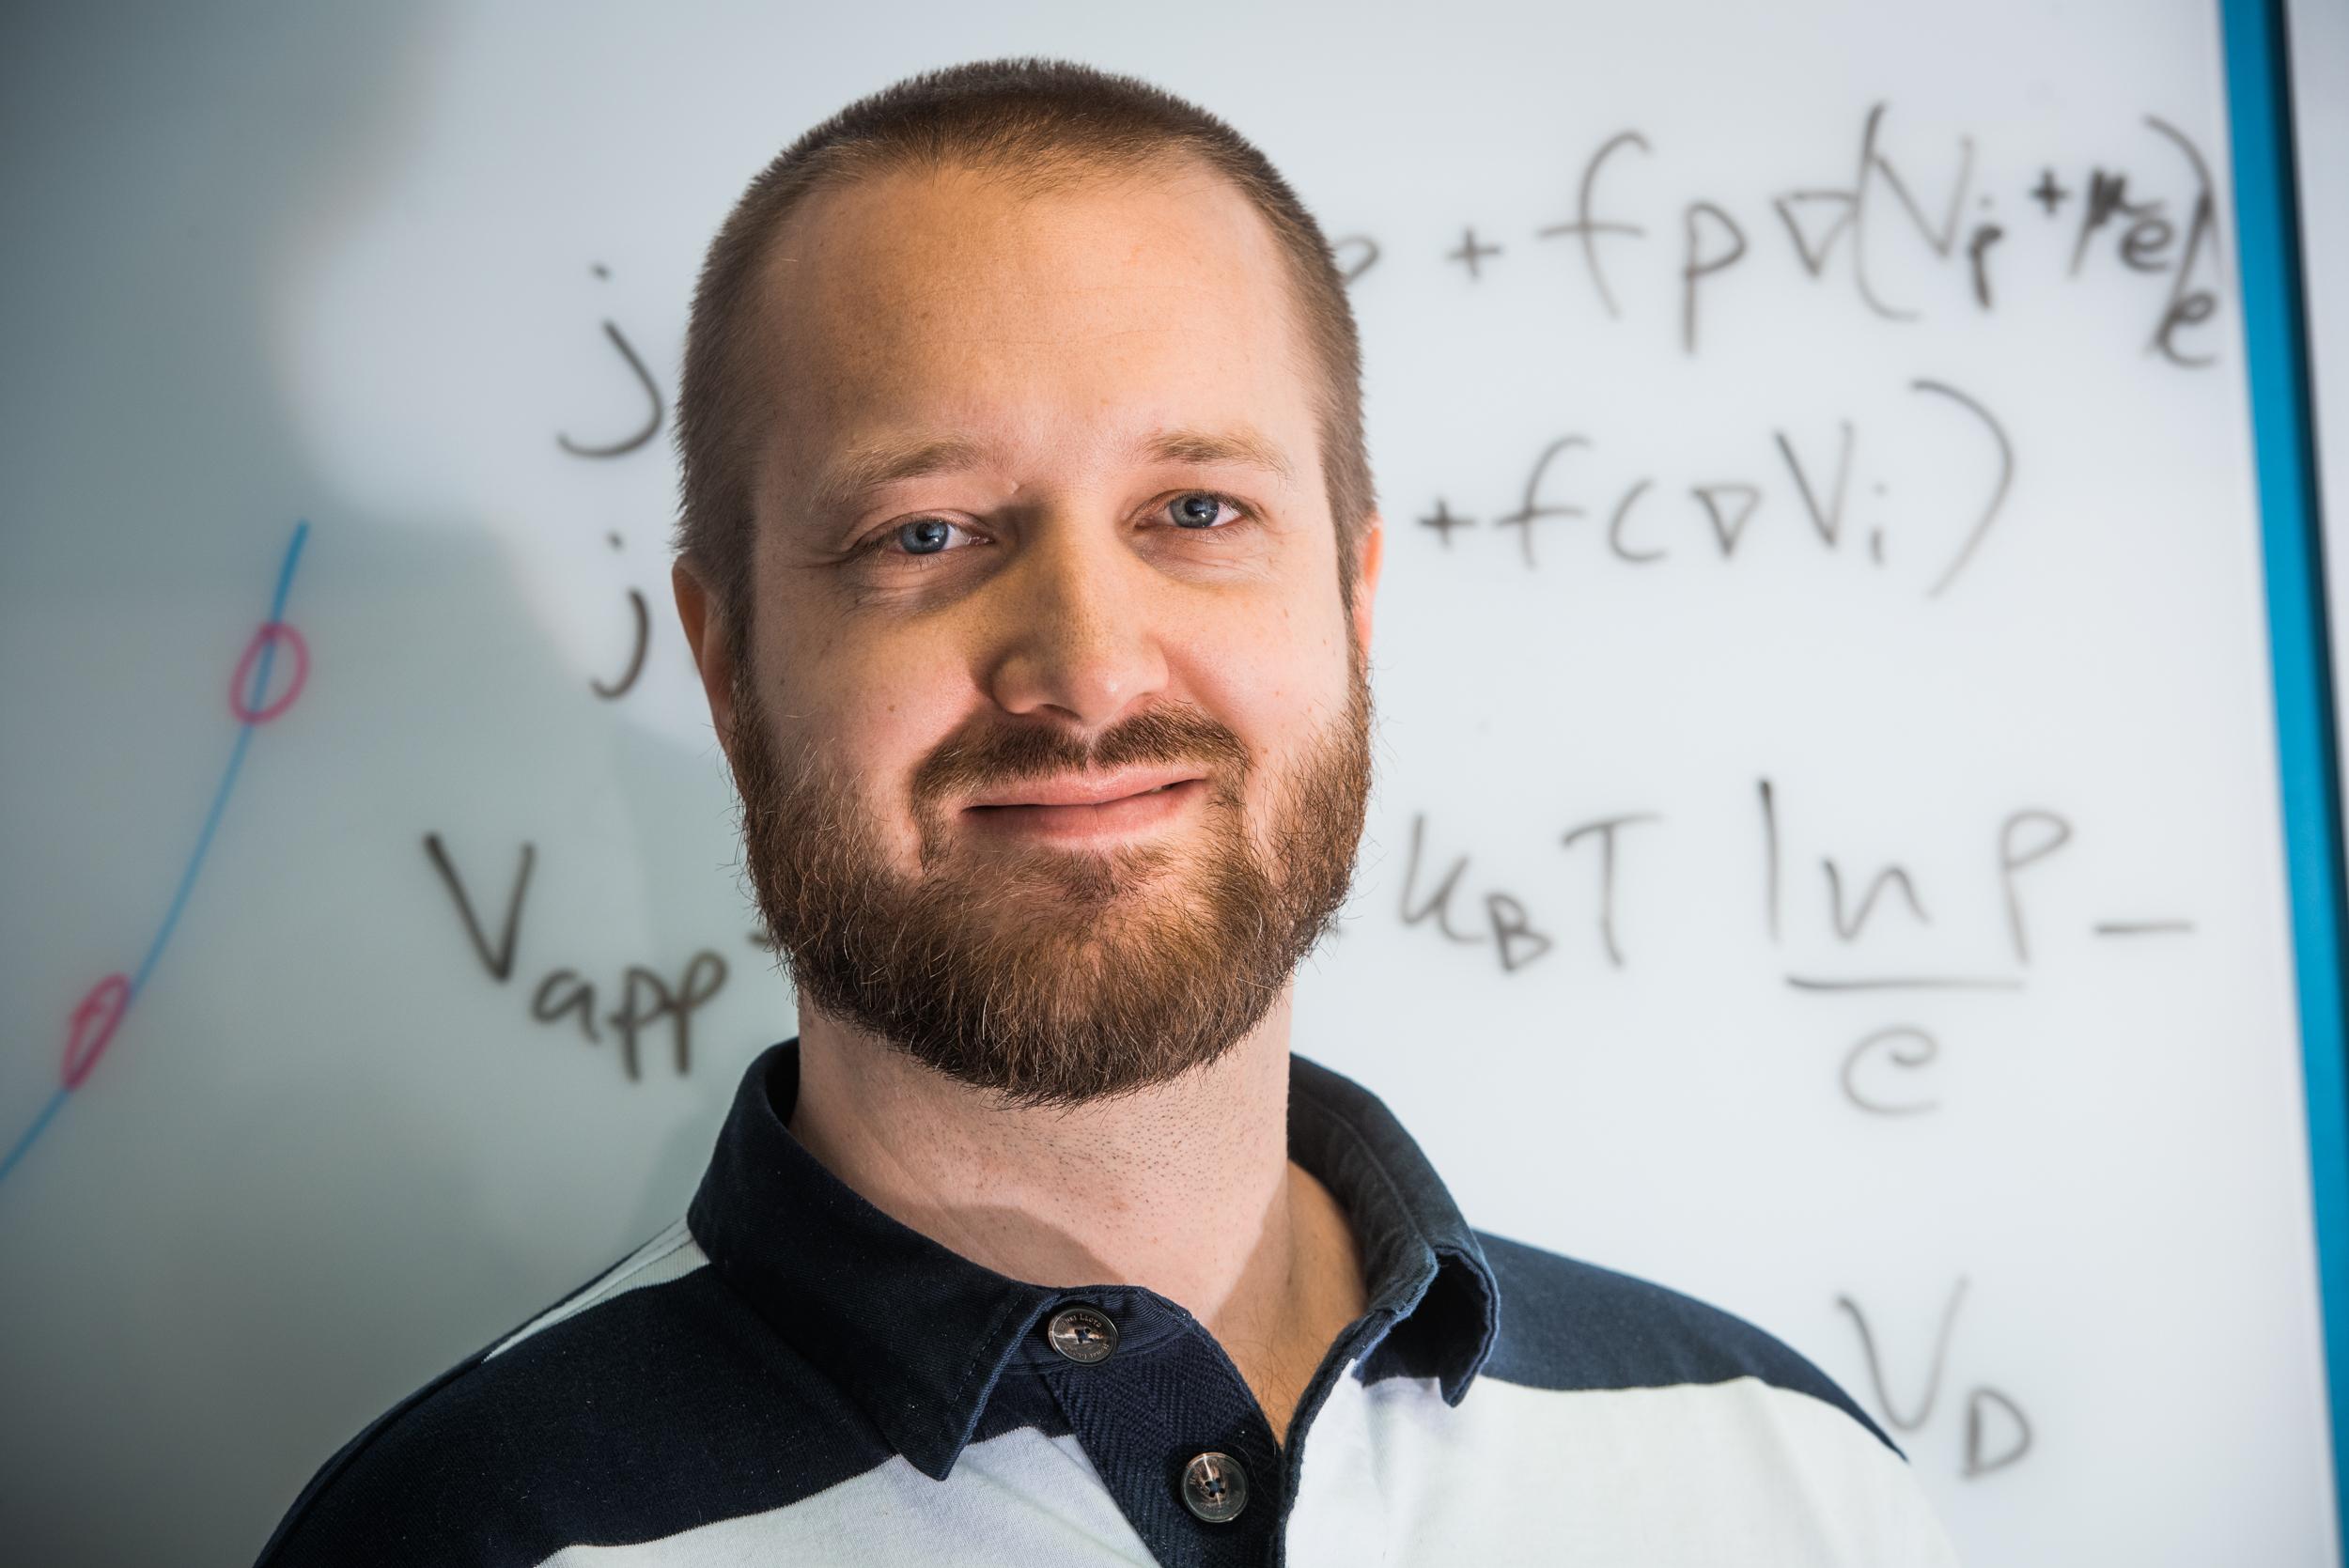 Klas Tybrandt, researcher at Laboratory for Organic Electronics